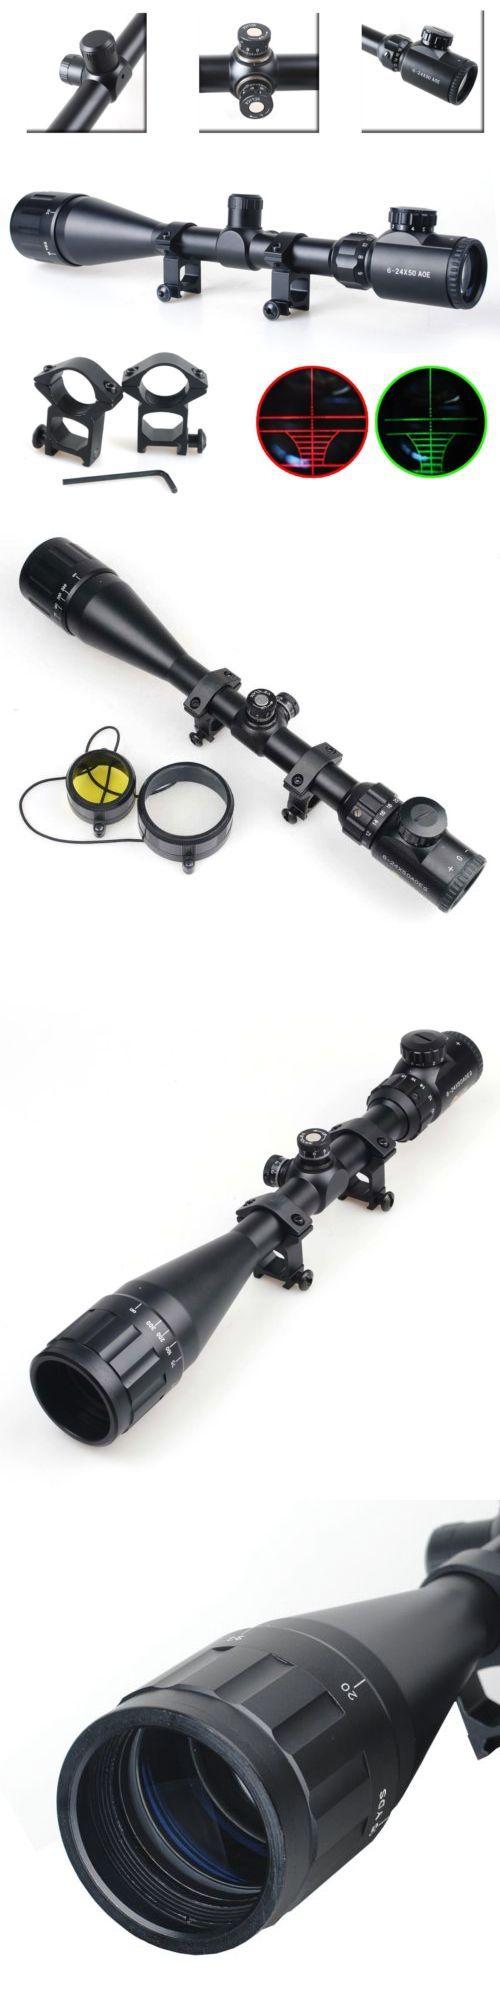 Rifle Scopes 31714: Cvlife 6-24X50 Aoe Rifle Scope Red And Green Mil-Dot Illuminated Optics Hunting -> BUY IT NOW ONLY: $38.99 on eBay!